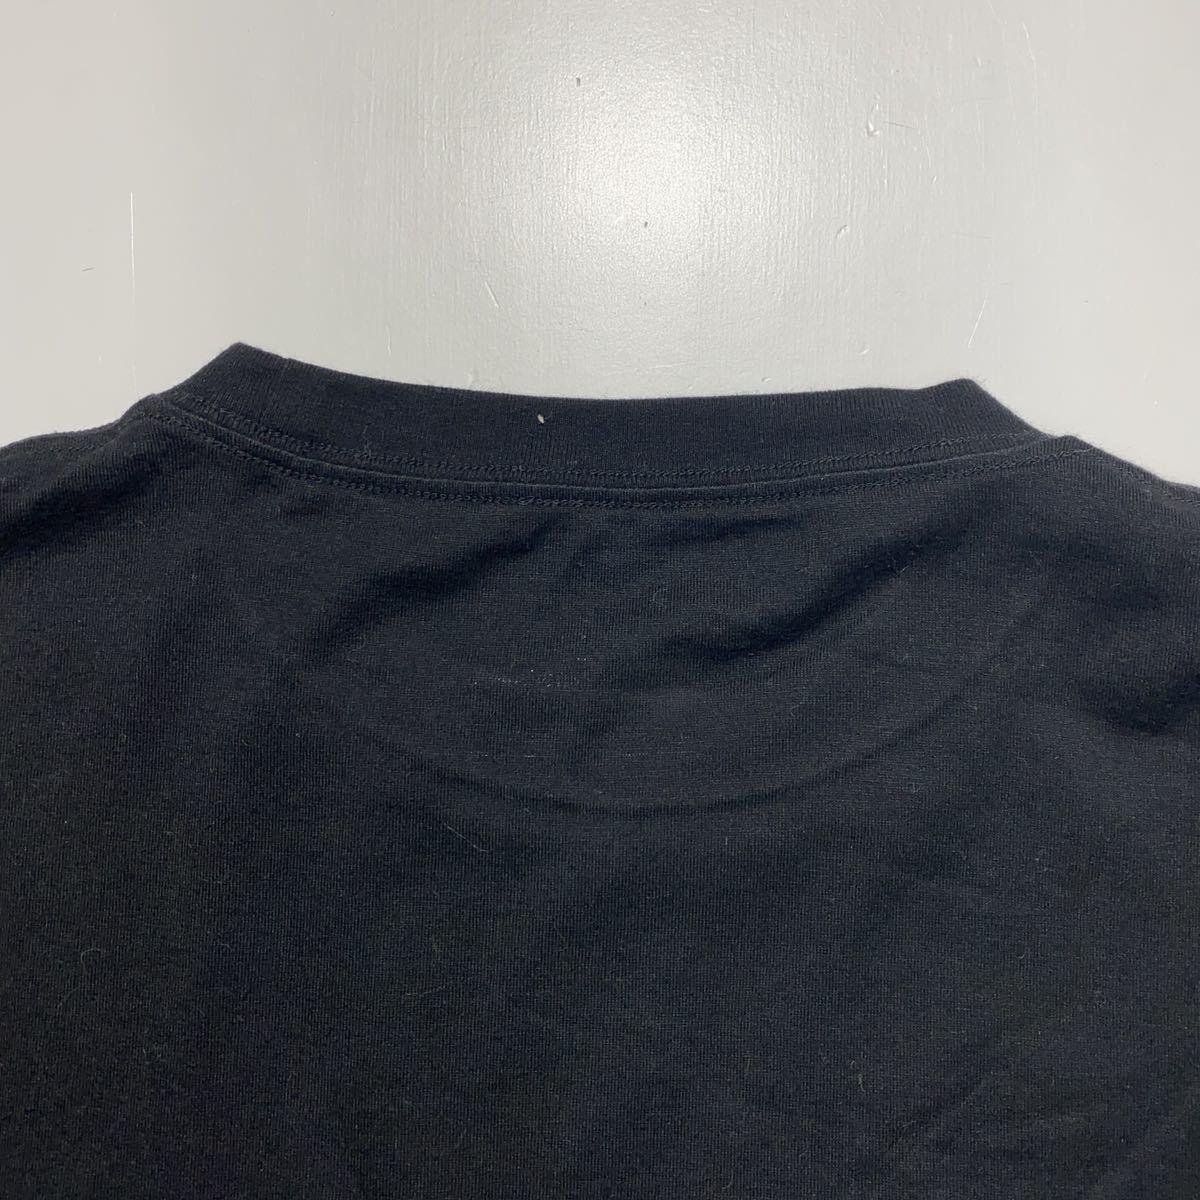 【3】uniform experiment Fragment design Tee ユニフォーム エクスペリメント フラグメントデザイン Tシャツ ブラック G485_画像6